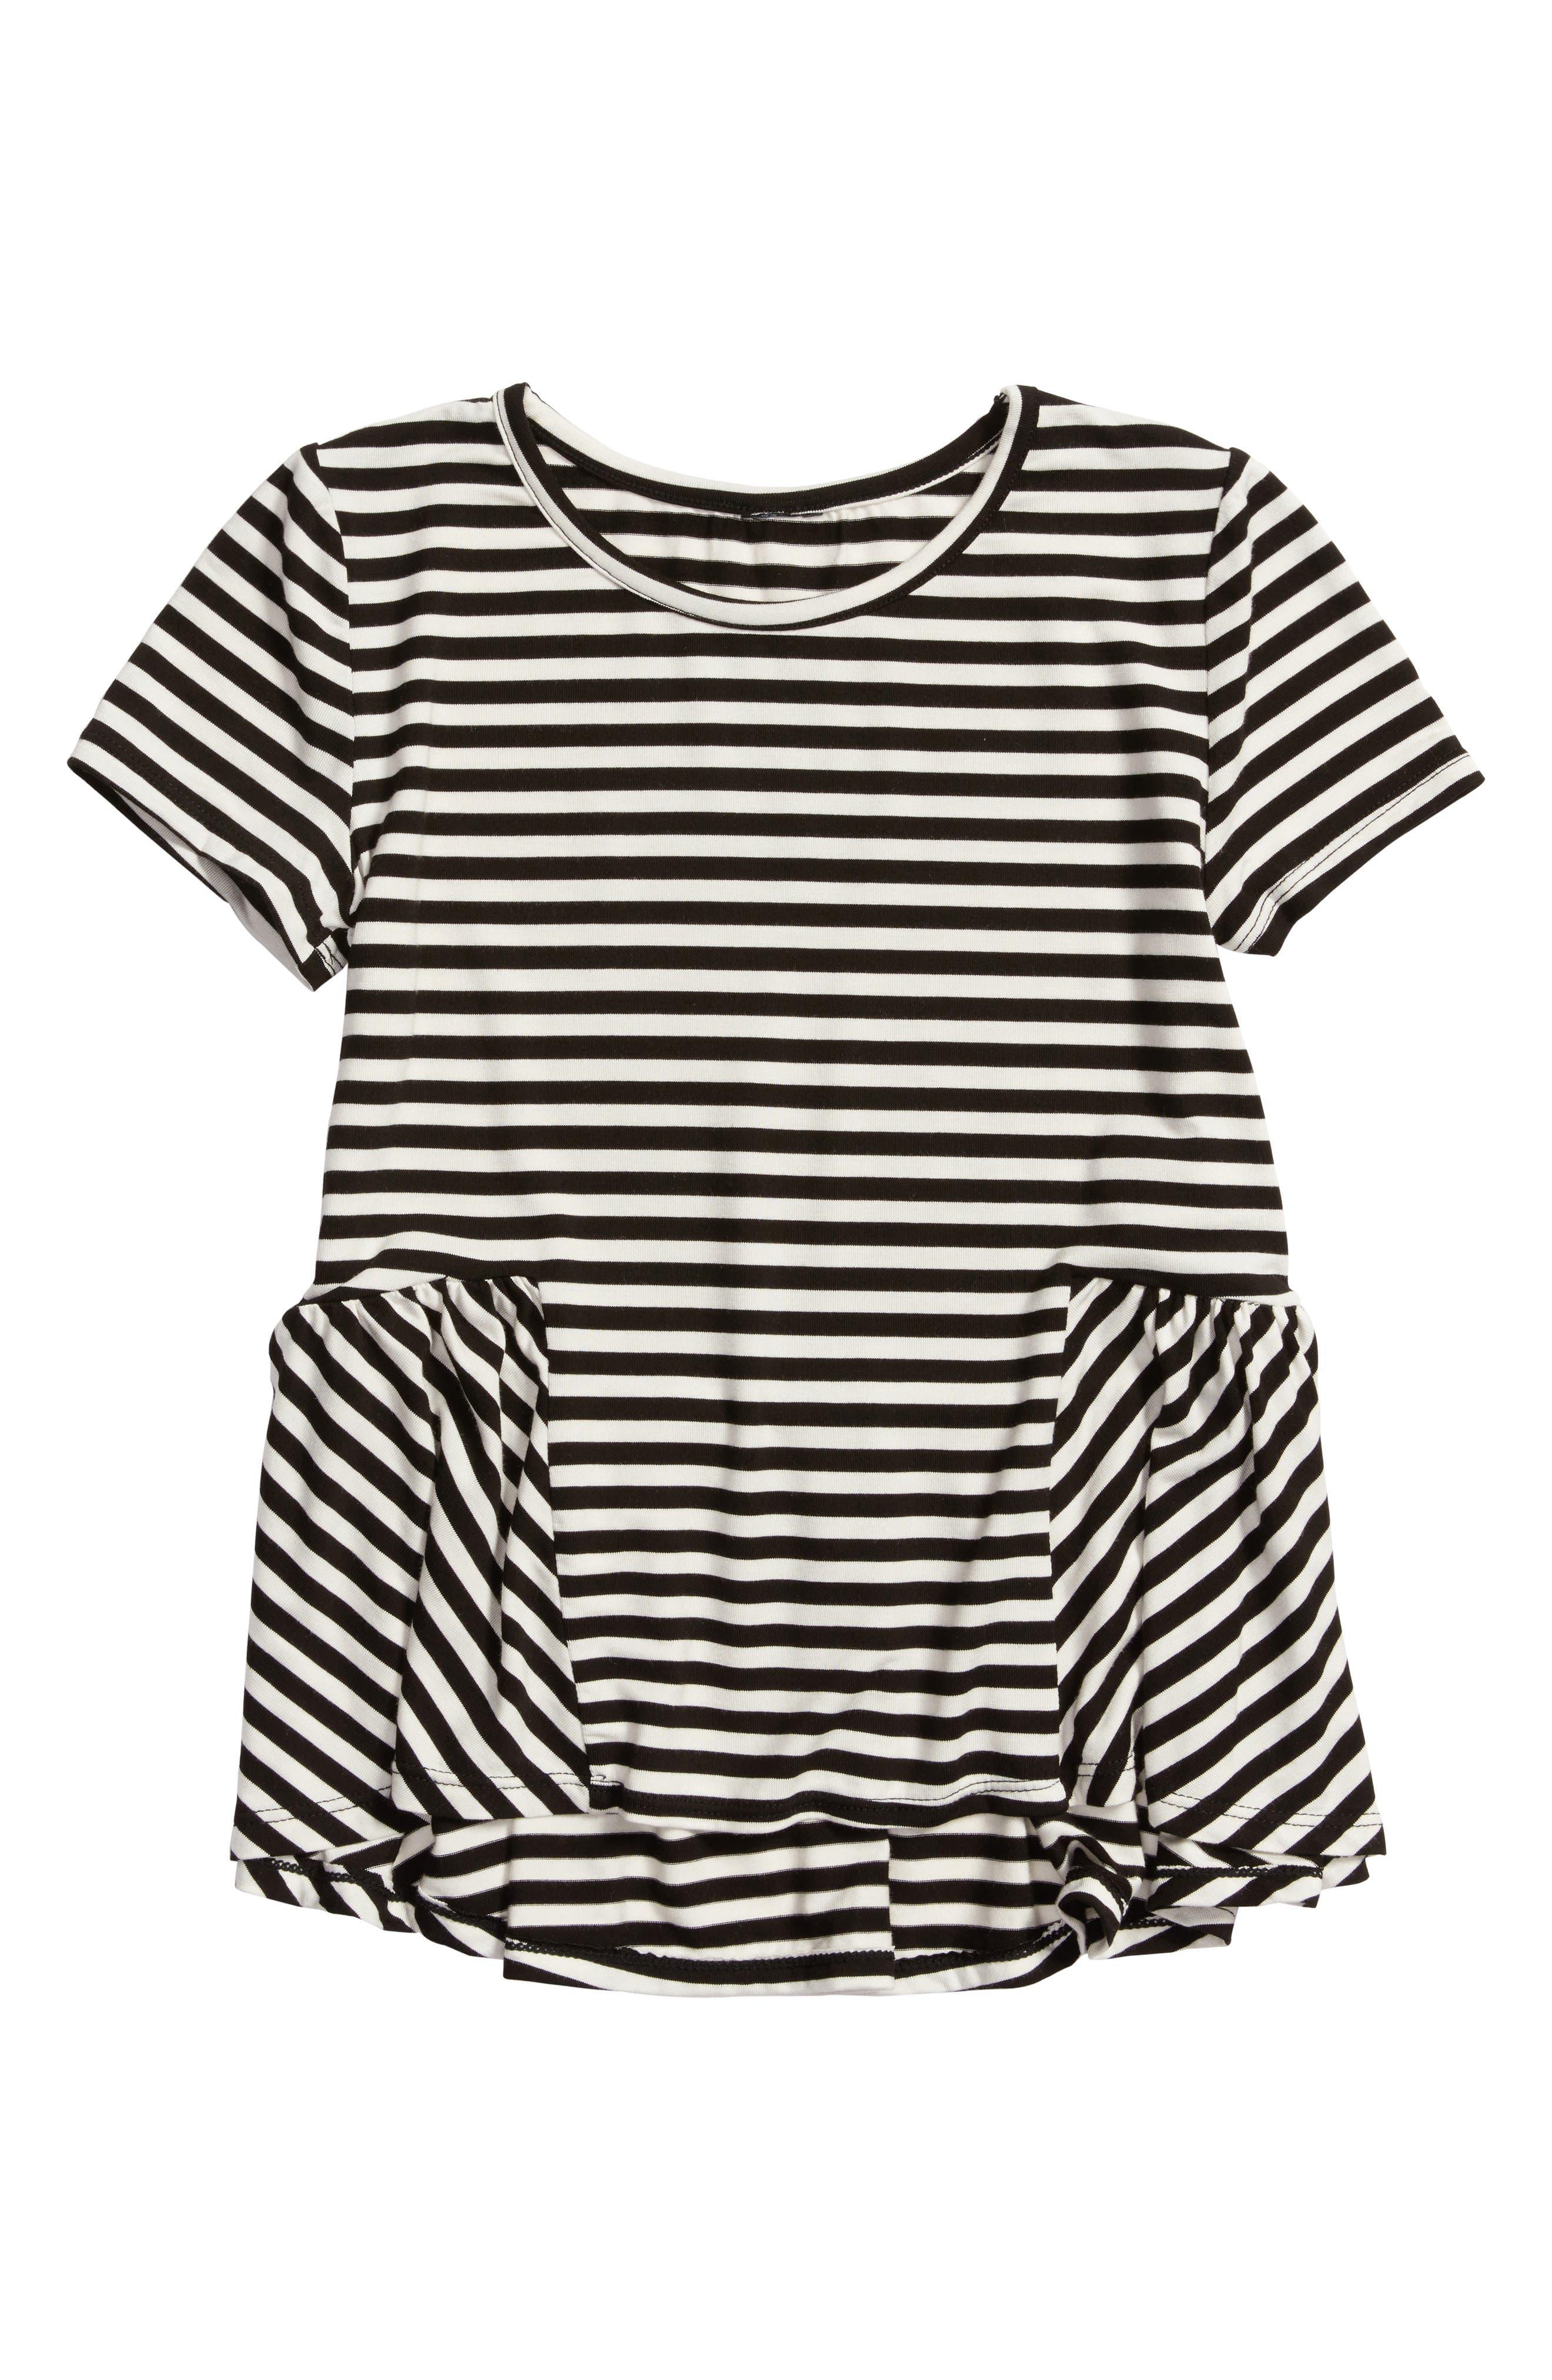 Peplum Tee,                             Main thumbnail 1, color,                             Black/ White Stripe